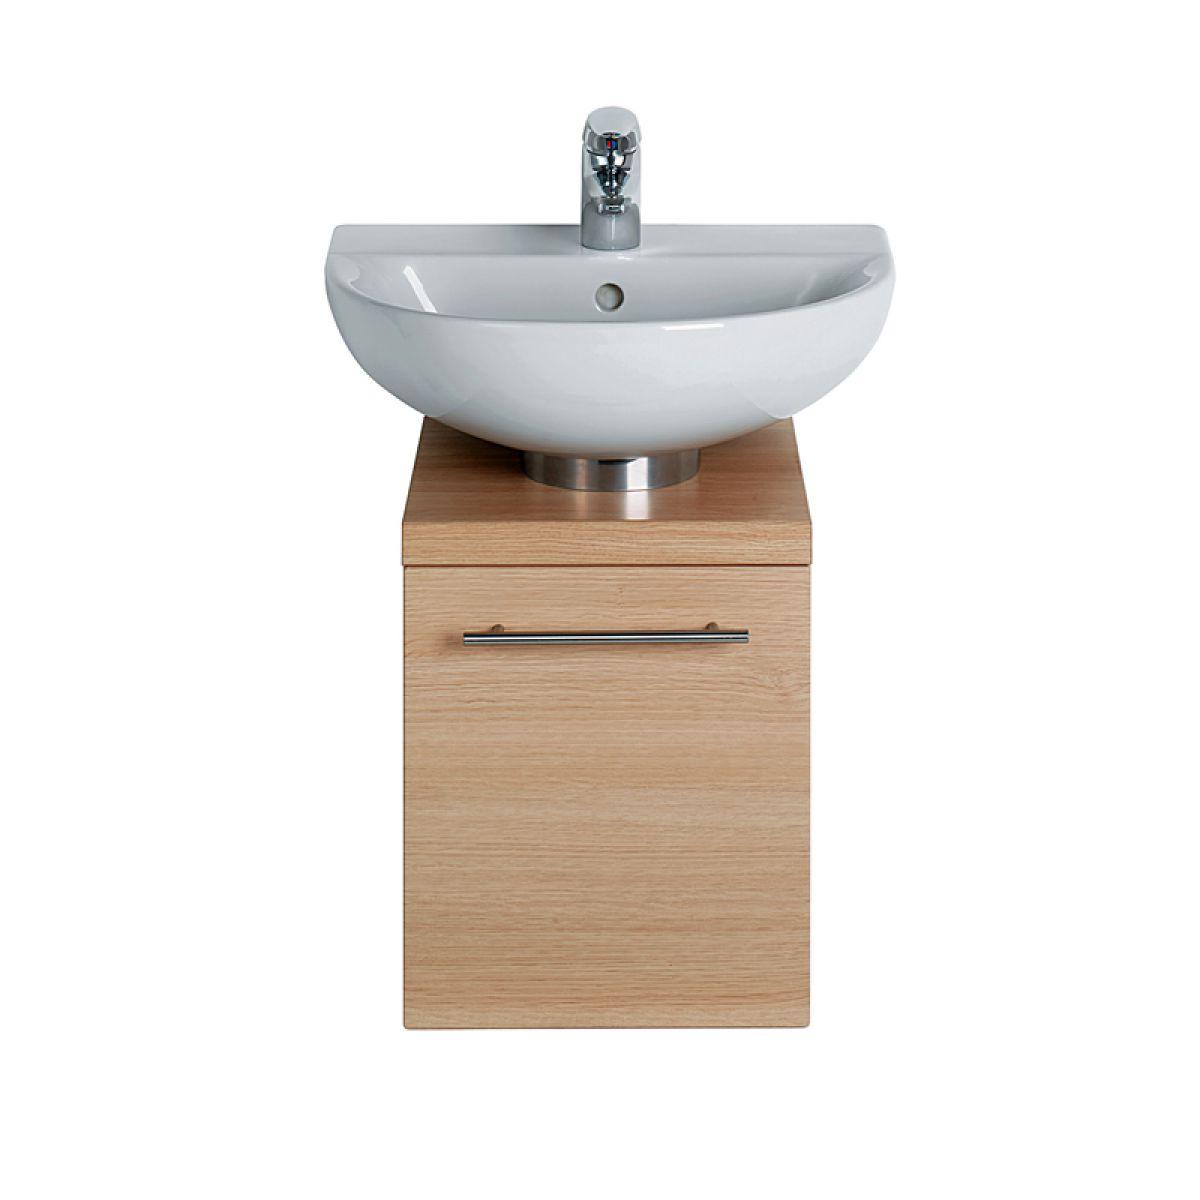 Pedestal Vanity Unit : Ideal Standard Create Furniture 3/4 Pedestal Unit : UK Bathrooms